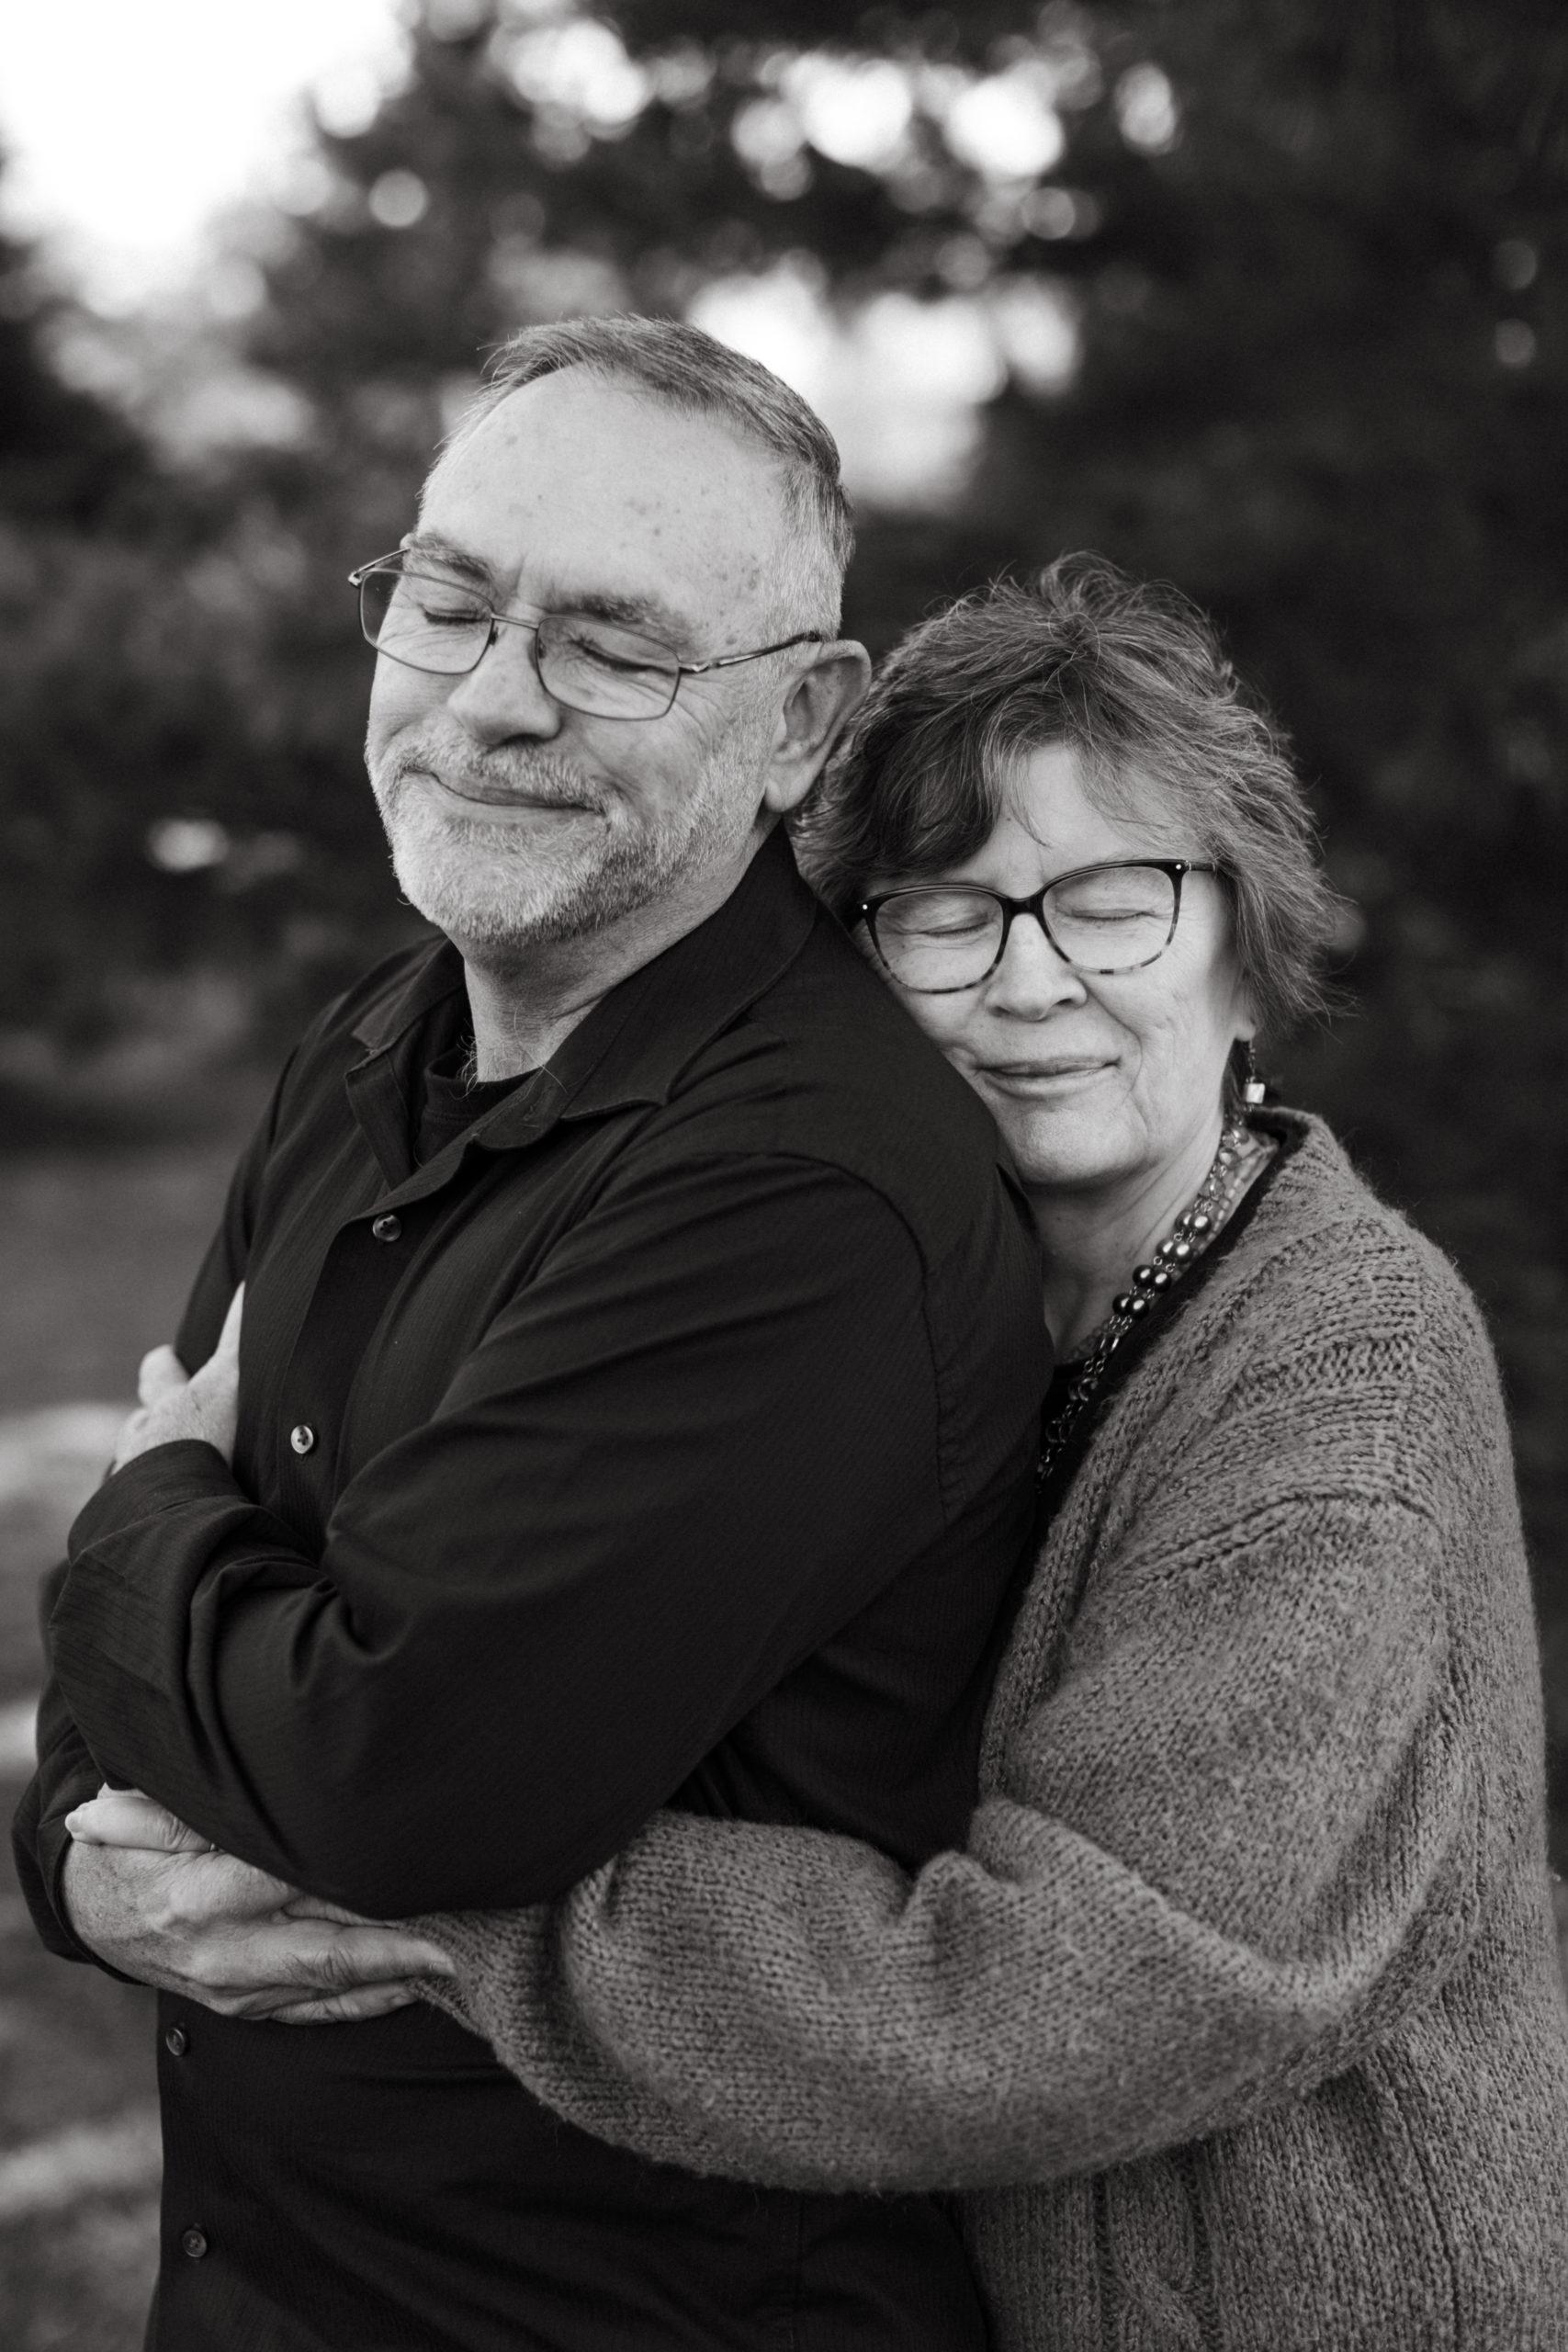 Married couple celebrates anniversary in Cincinnati, Ohio